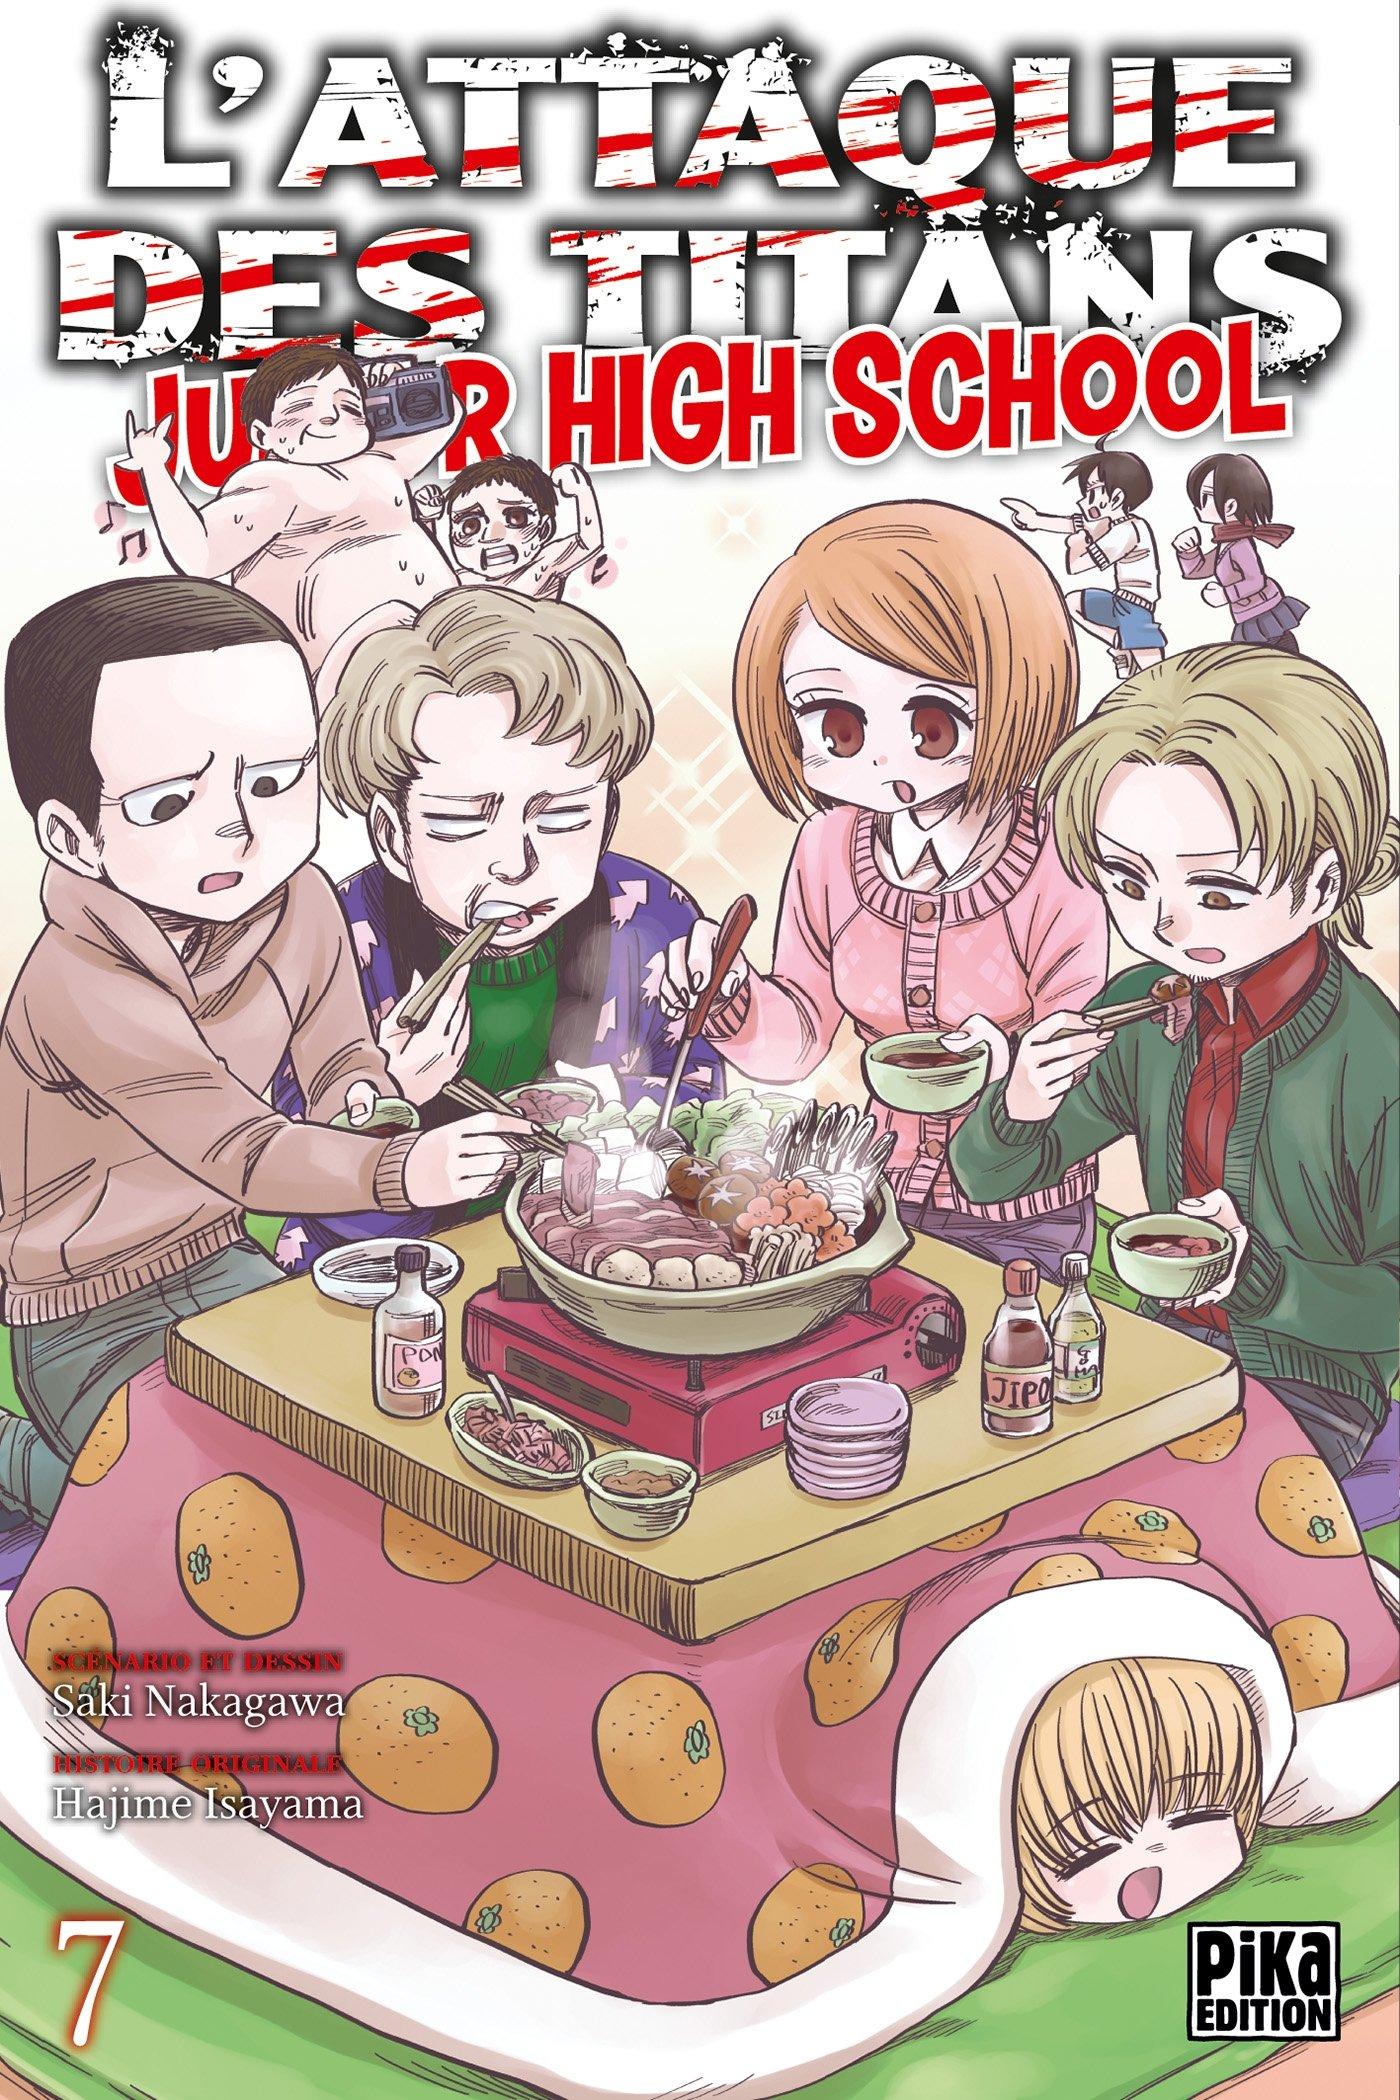 L'attaque des titans - Junior high school 7